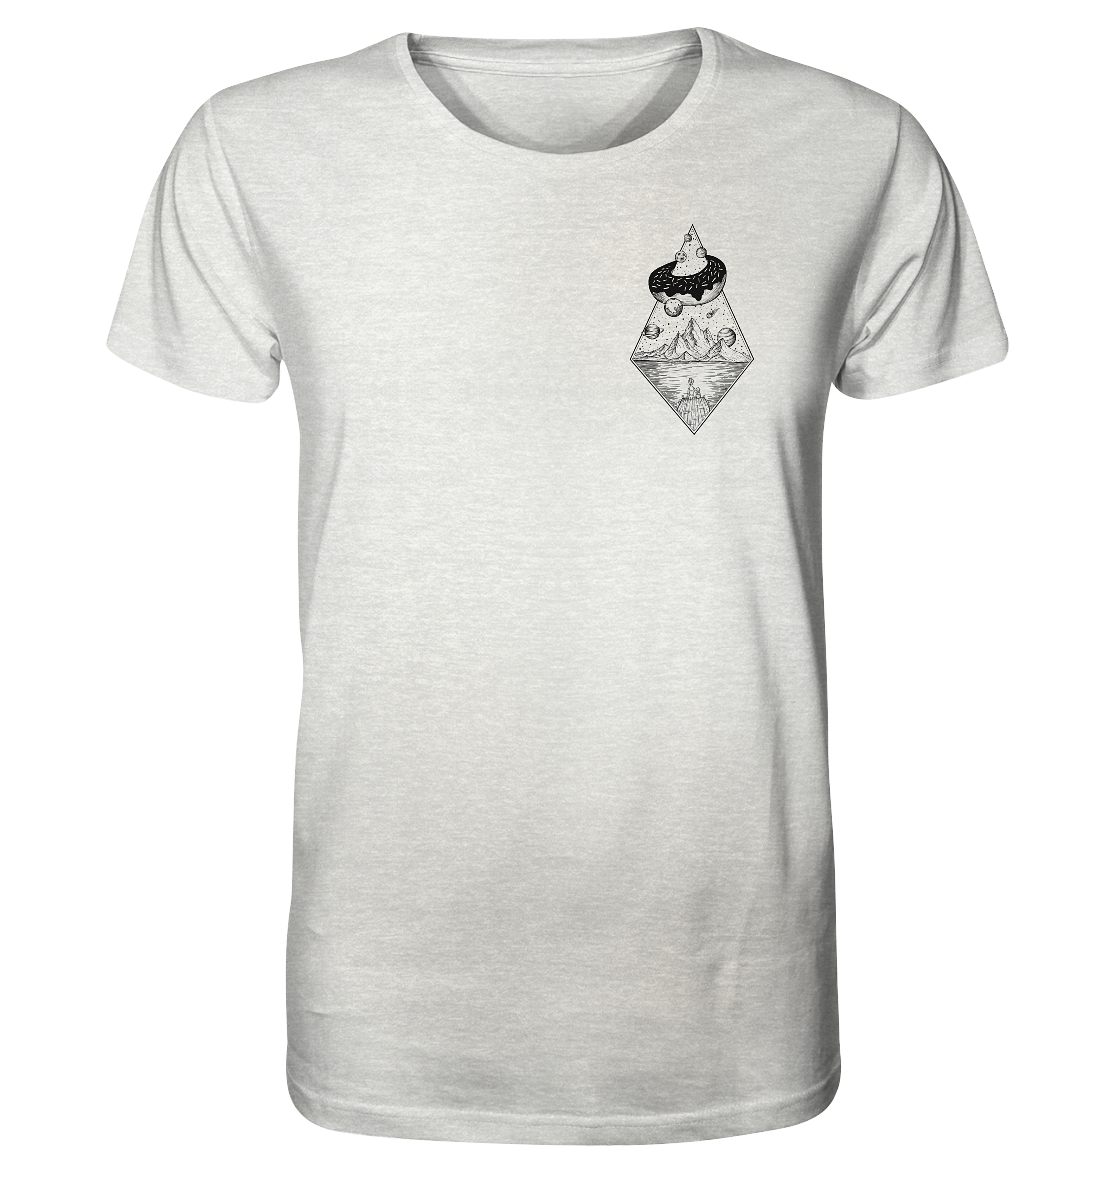 front-organic-shirt-meliert-f2f5f3-1116x.png